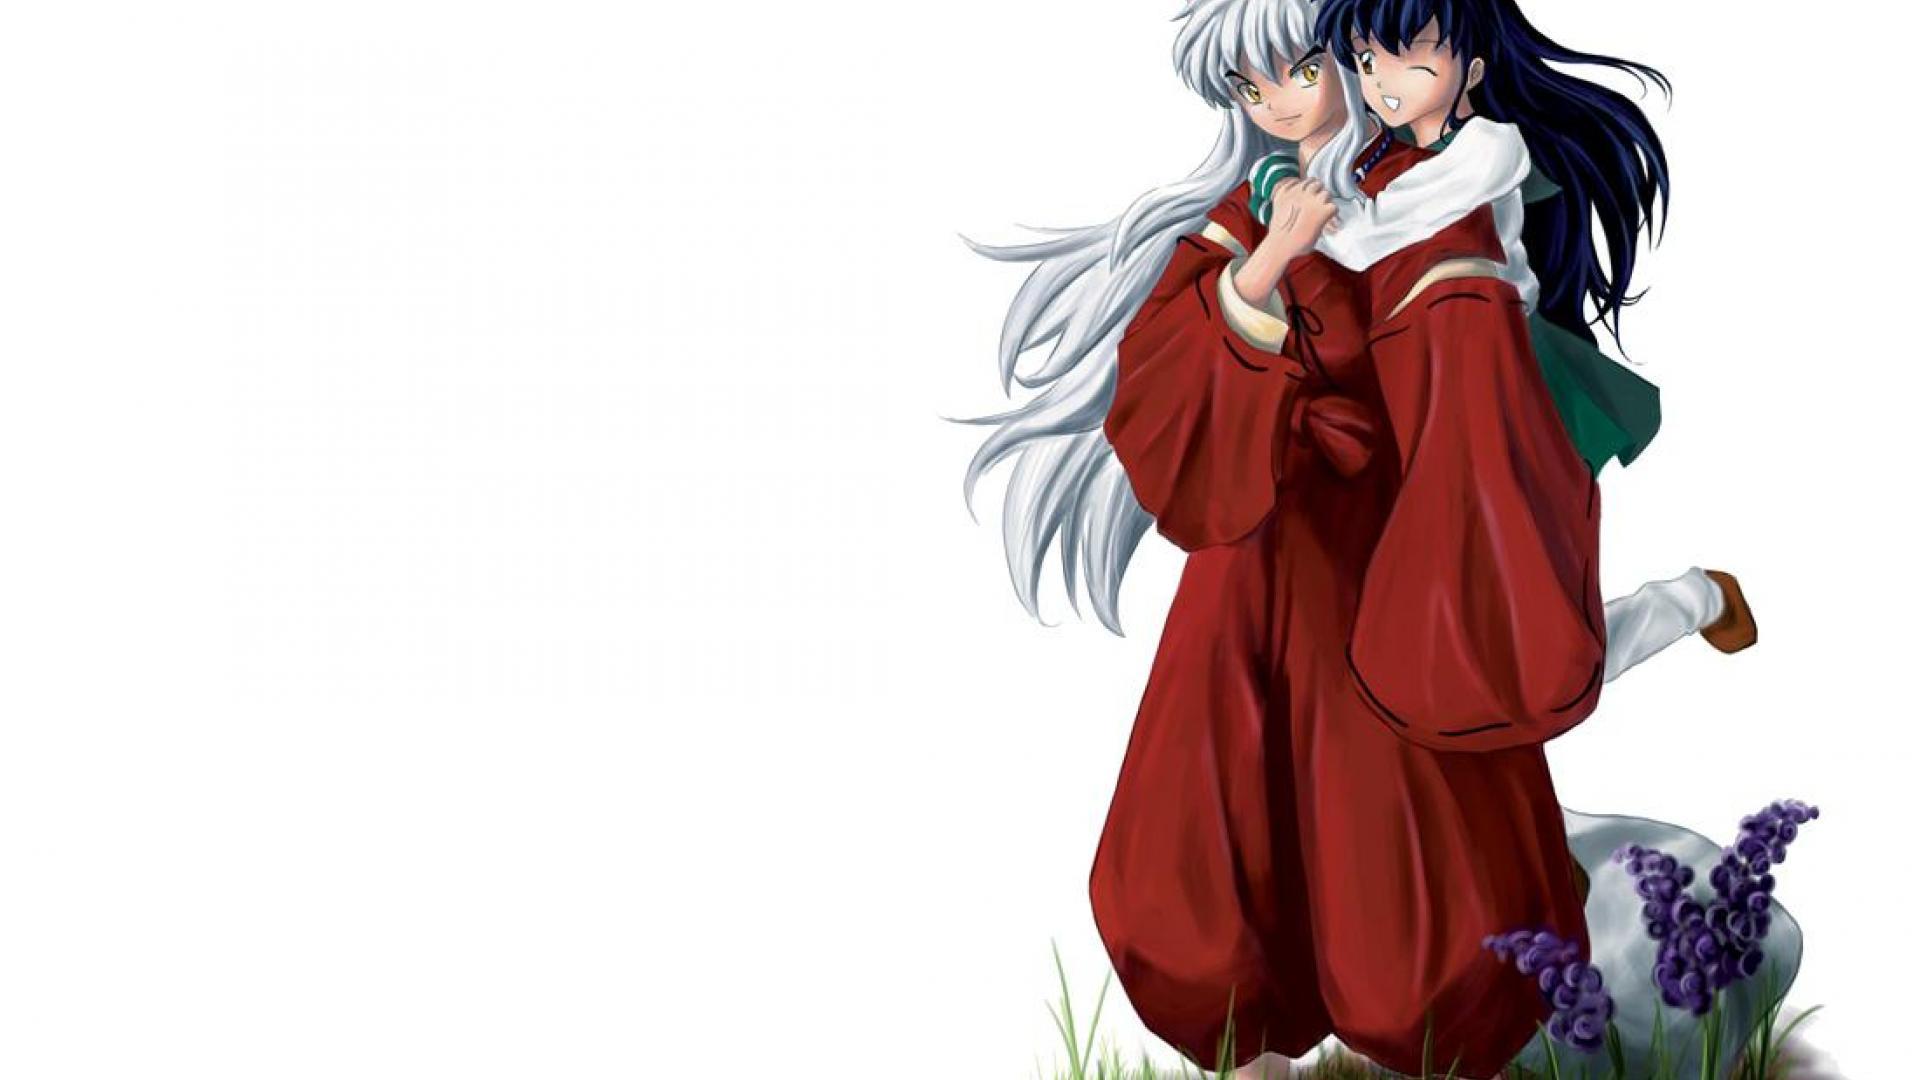 Cute Hugging Couples Wallpapers Inuyasha Wallpaper 5